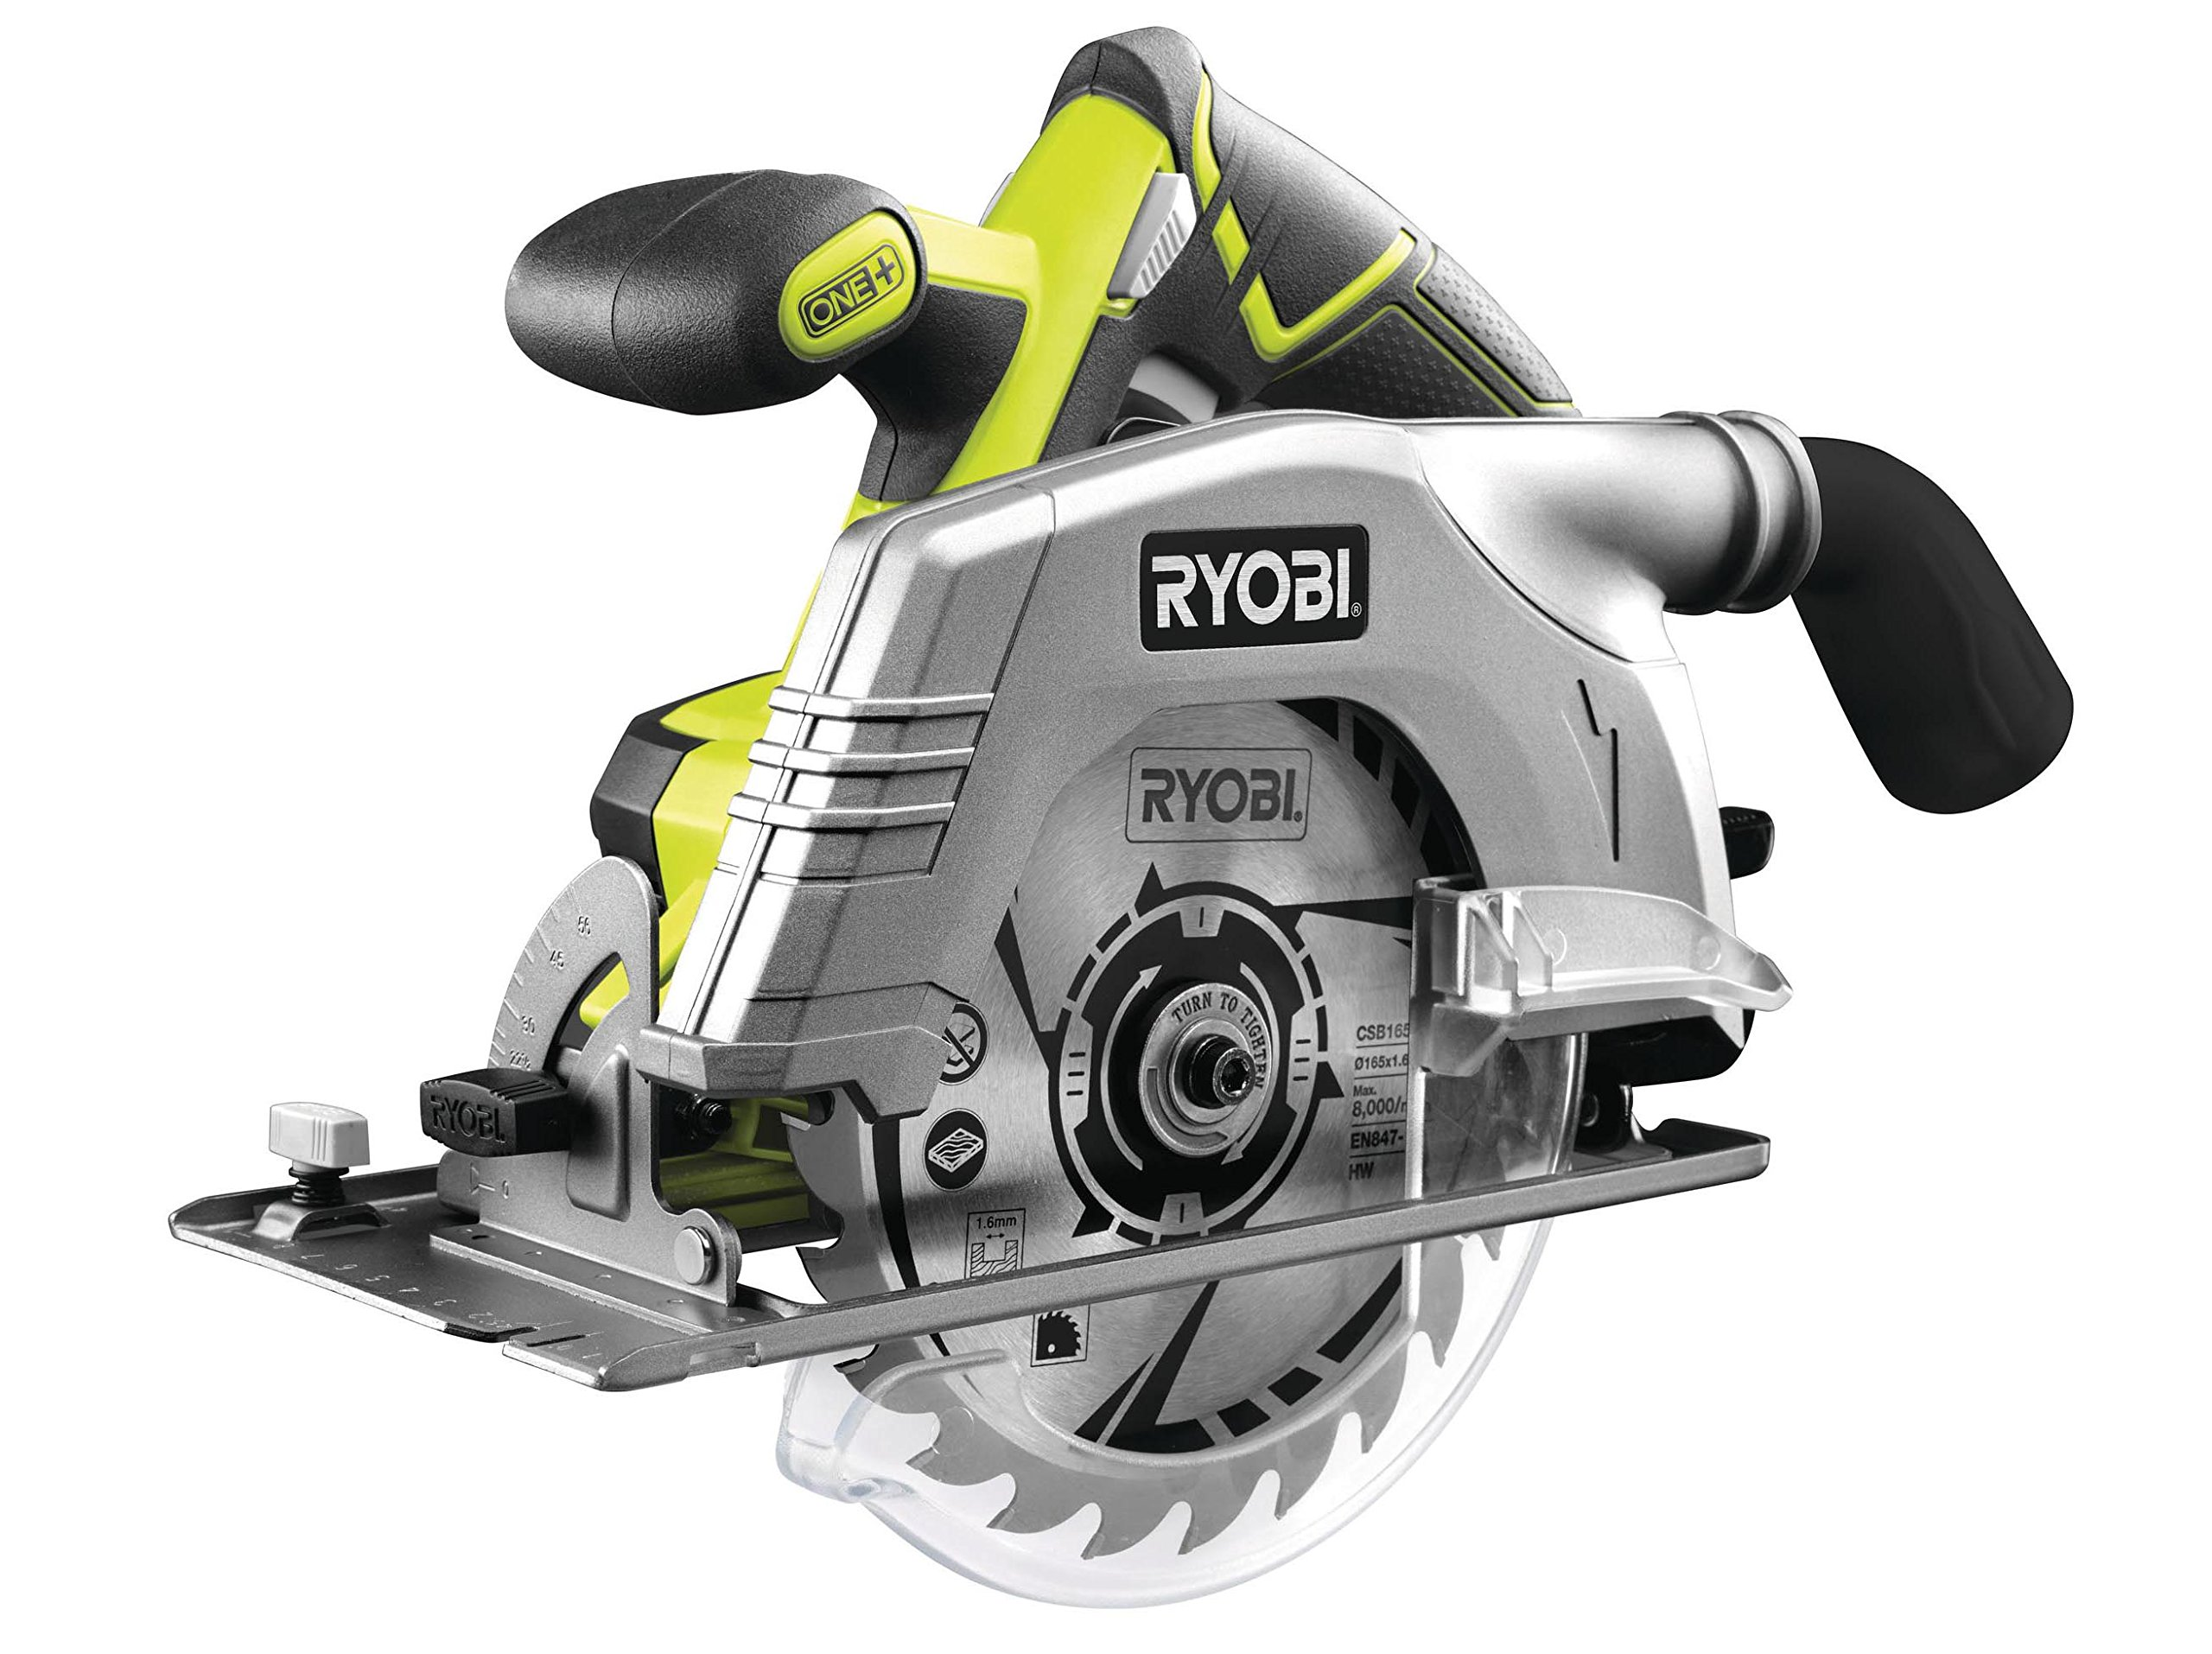 Ryobi ONE+ 18V 165mm Circular Saw 18 Volt Bare Unit R18CS-0 by Ryobi